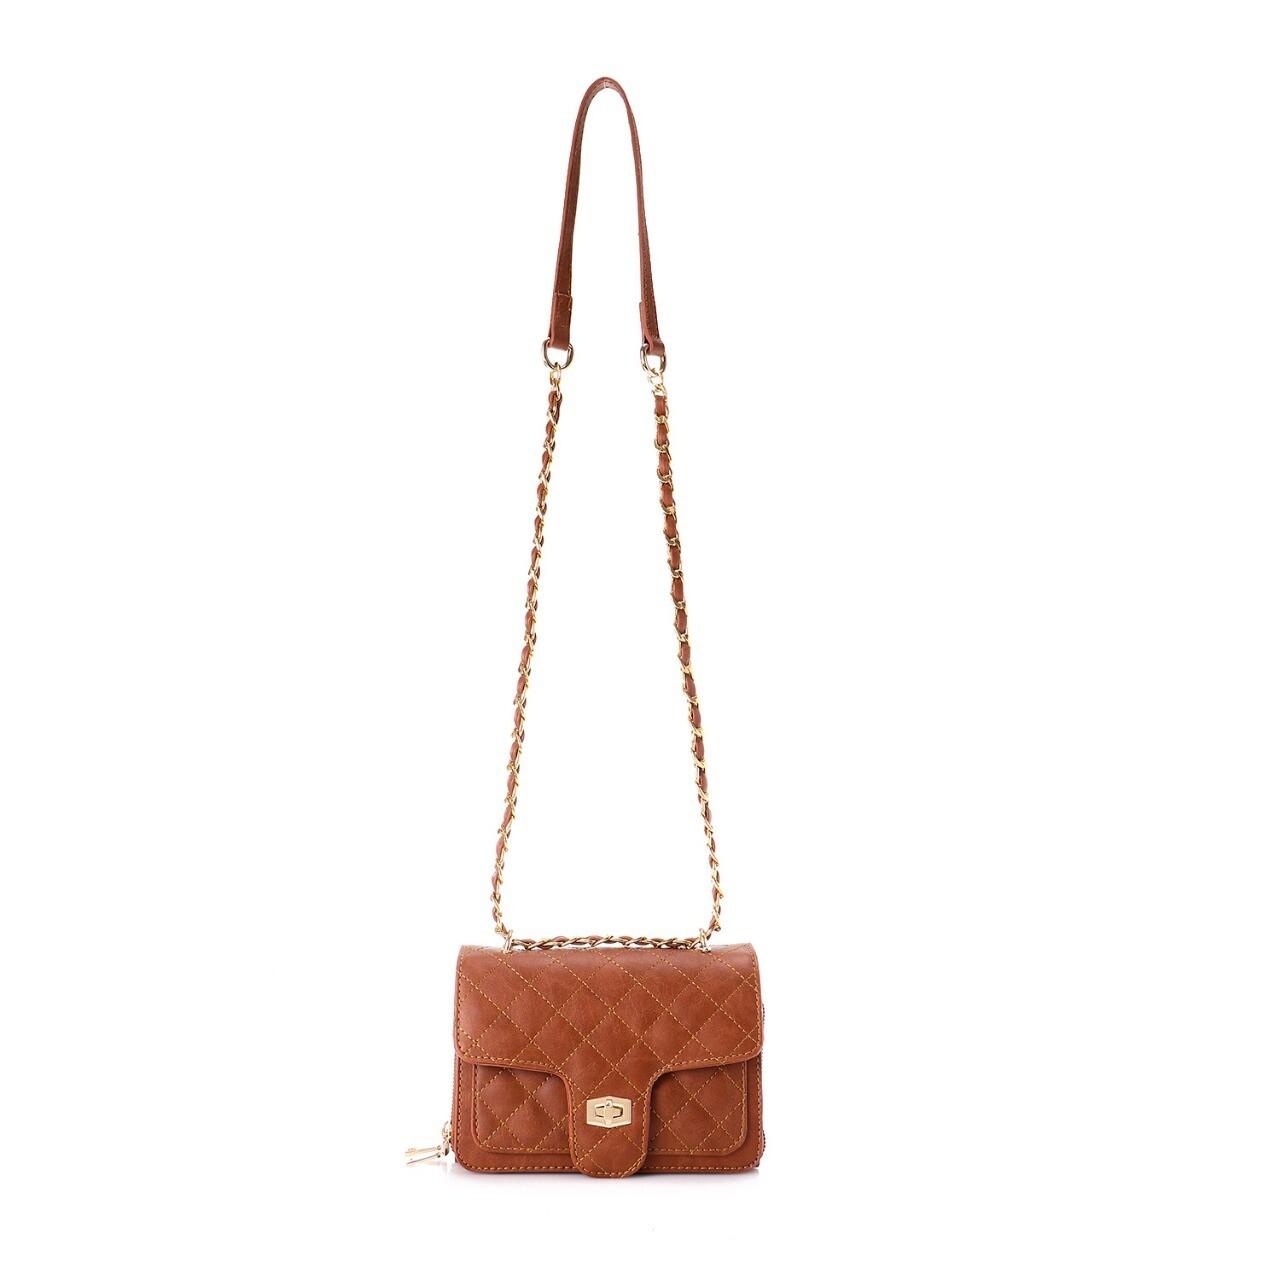 4835 Bag camel